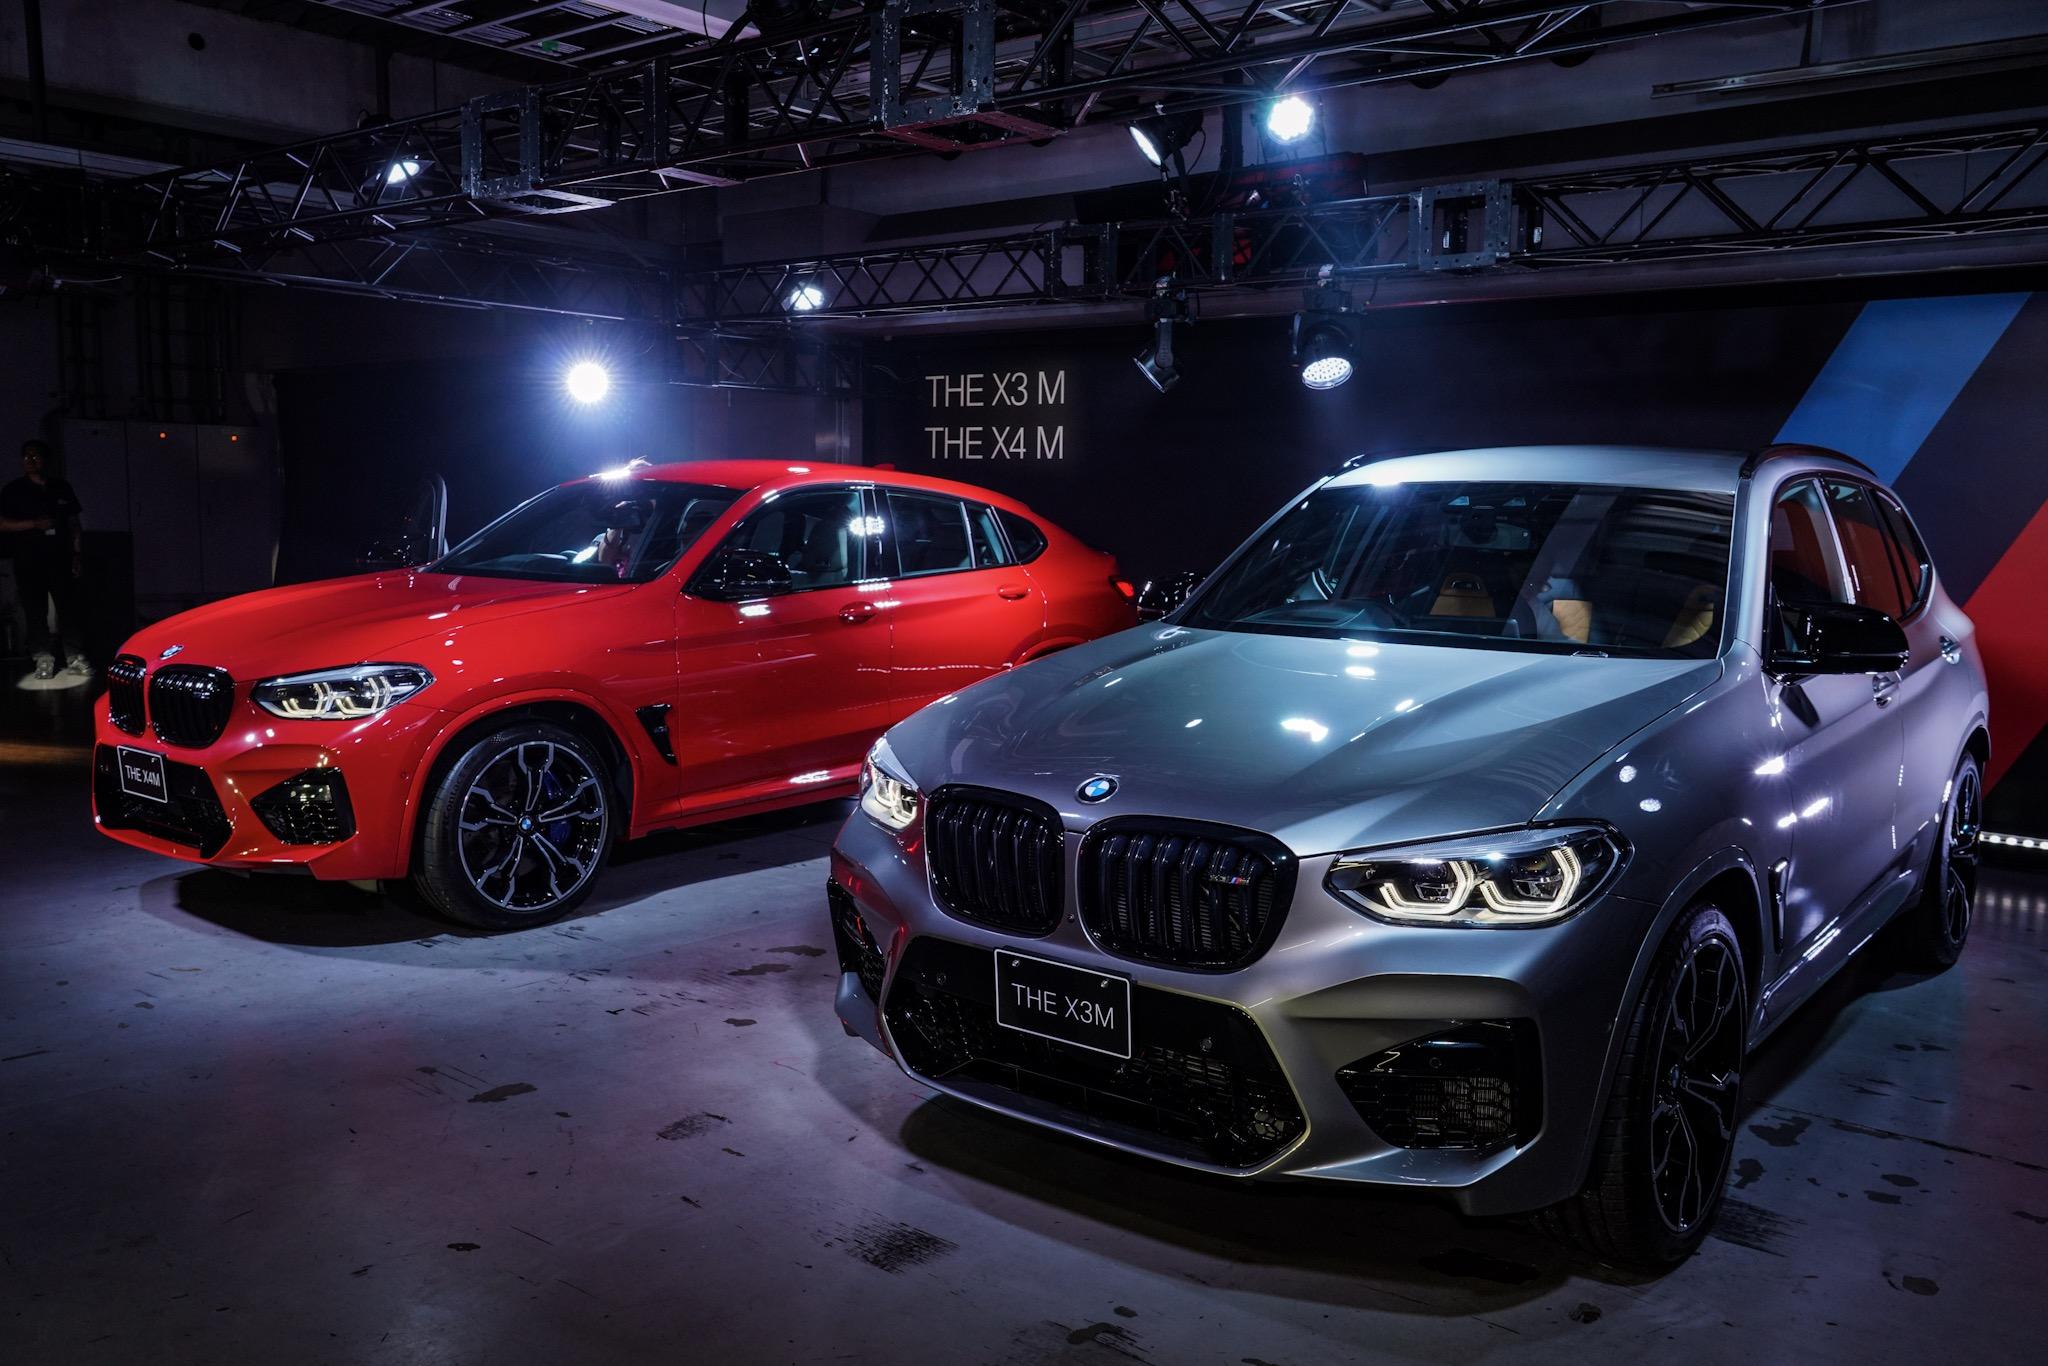 BMW X3 MとX4 M